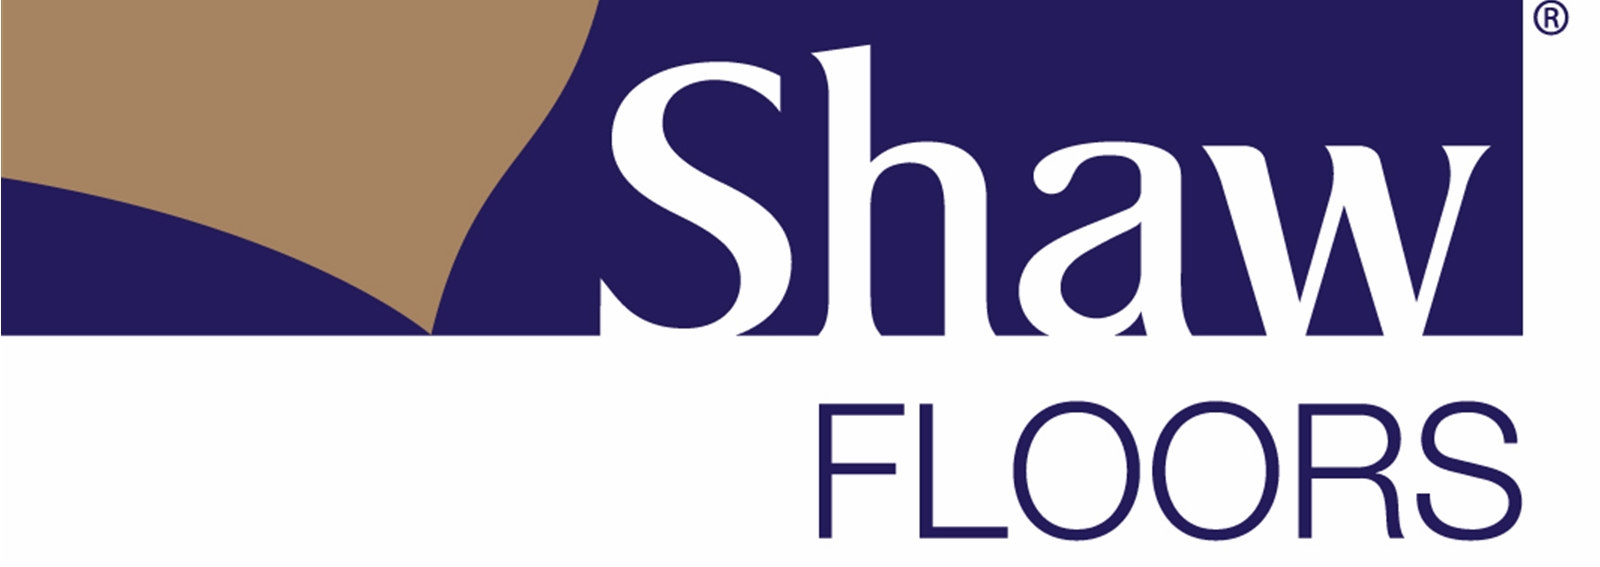 Shaw Floors Credit Card Payment  Login  Address